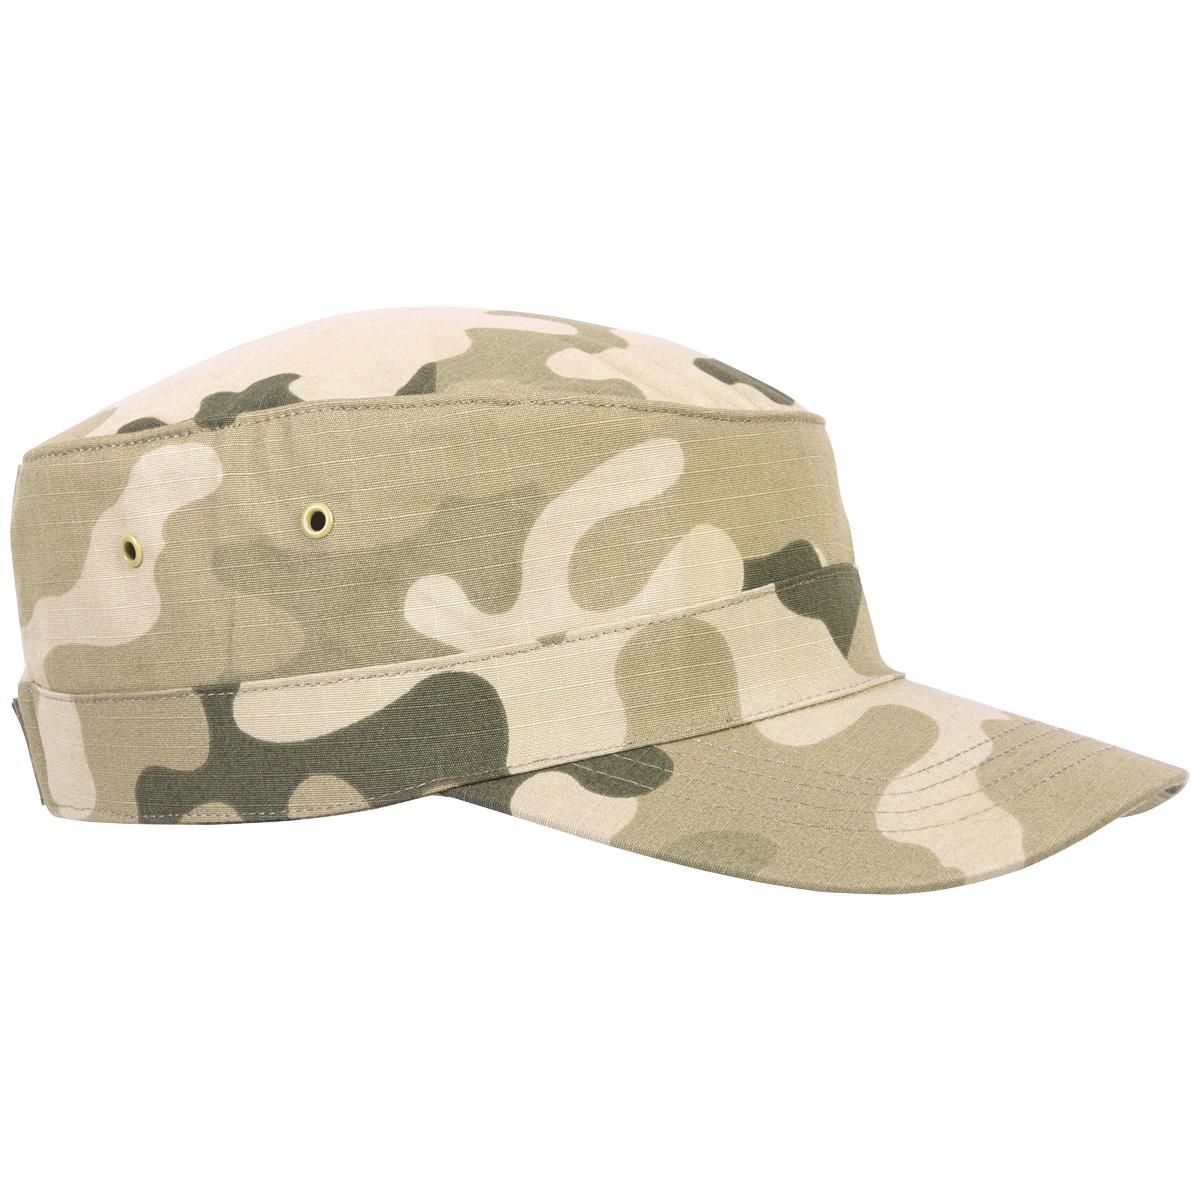 Helikon Tactical Mens Baseball Cap Army Military Hat Airsoft Polish Desert Camo